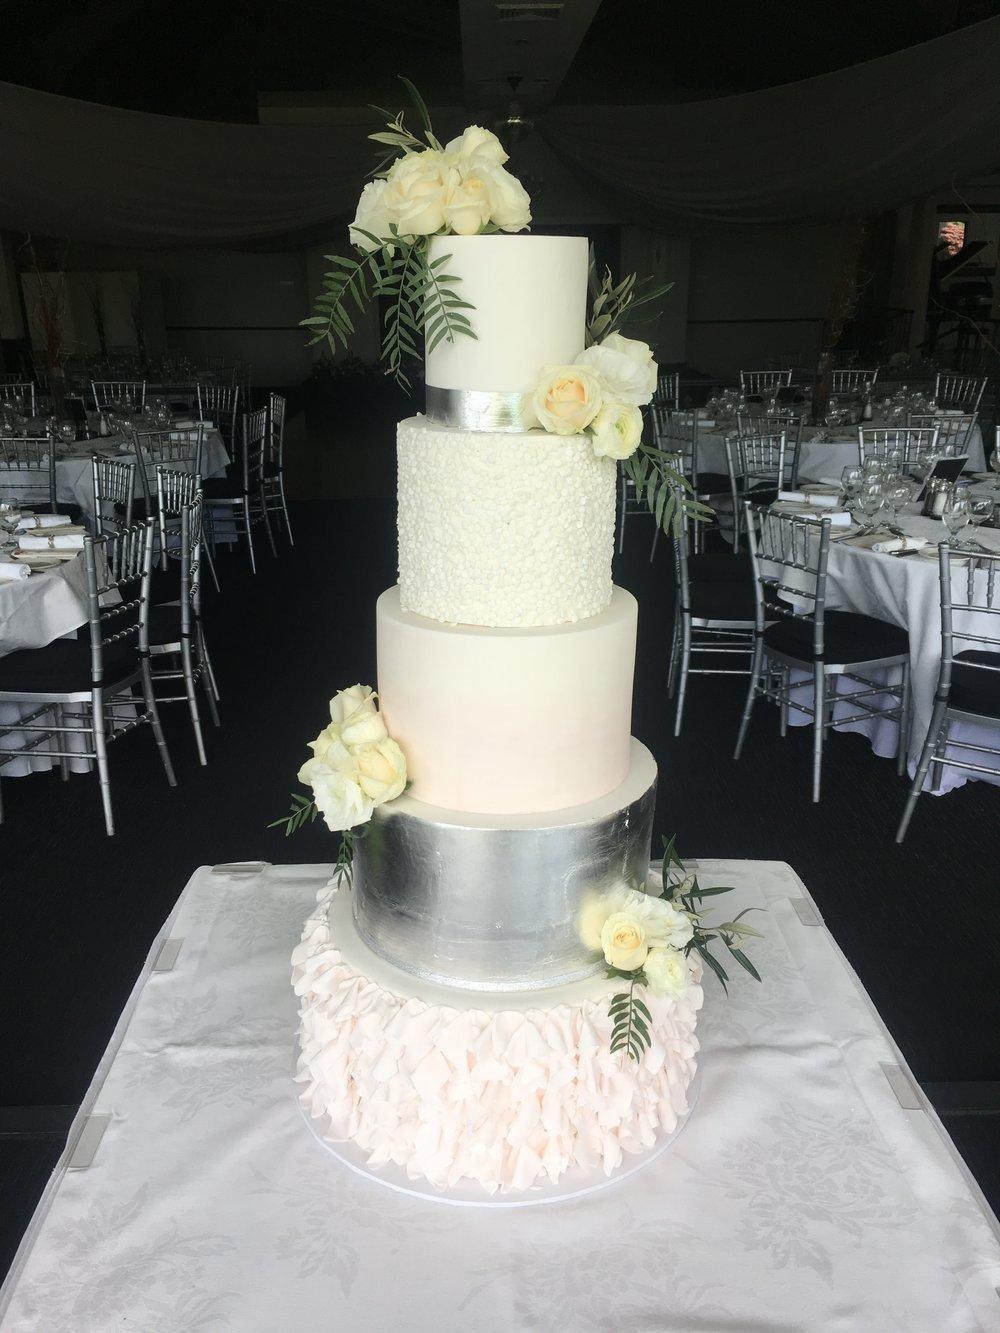 White Wedding Cake with Ruffles